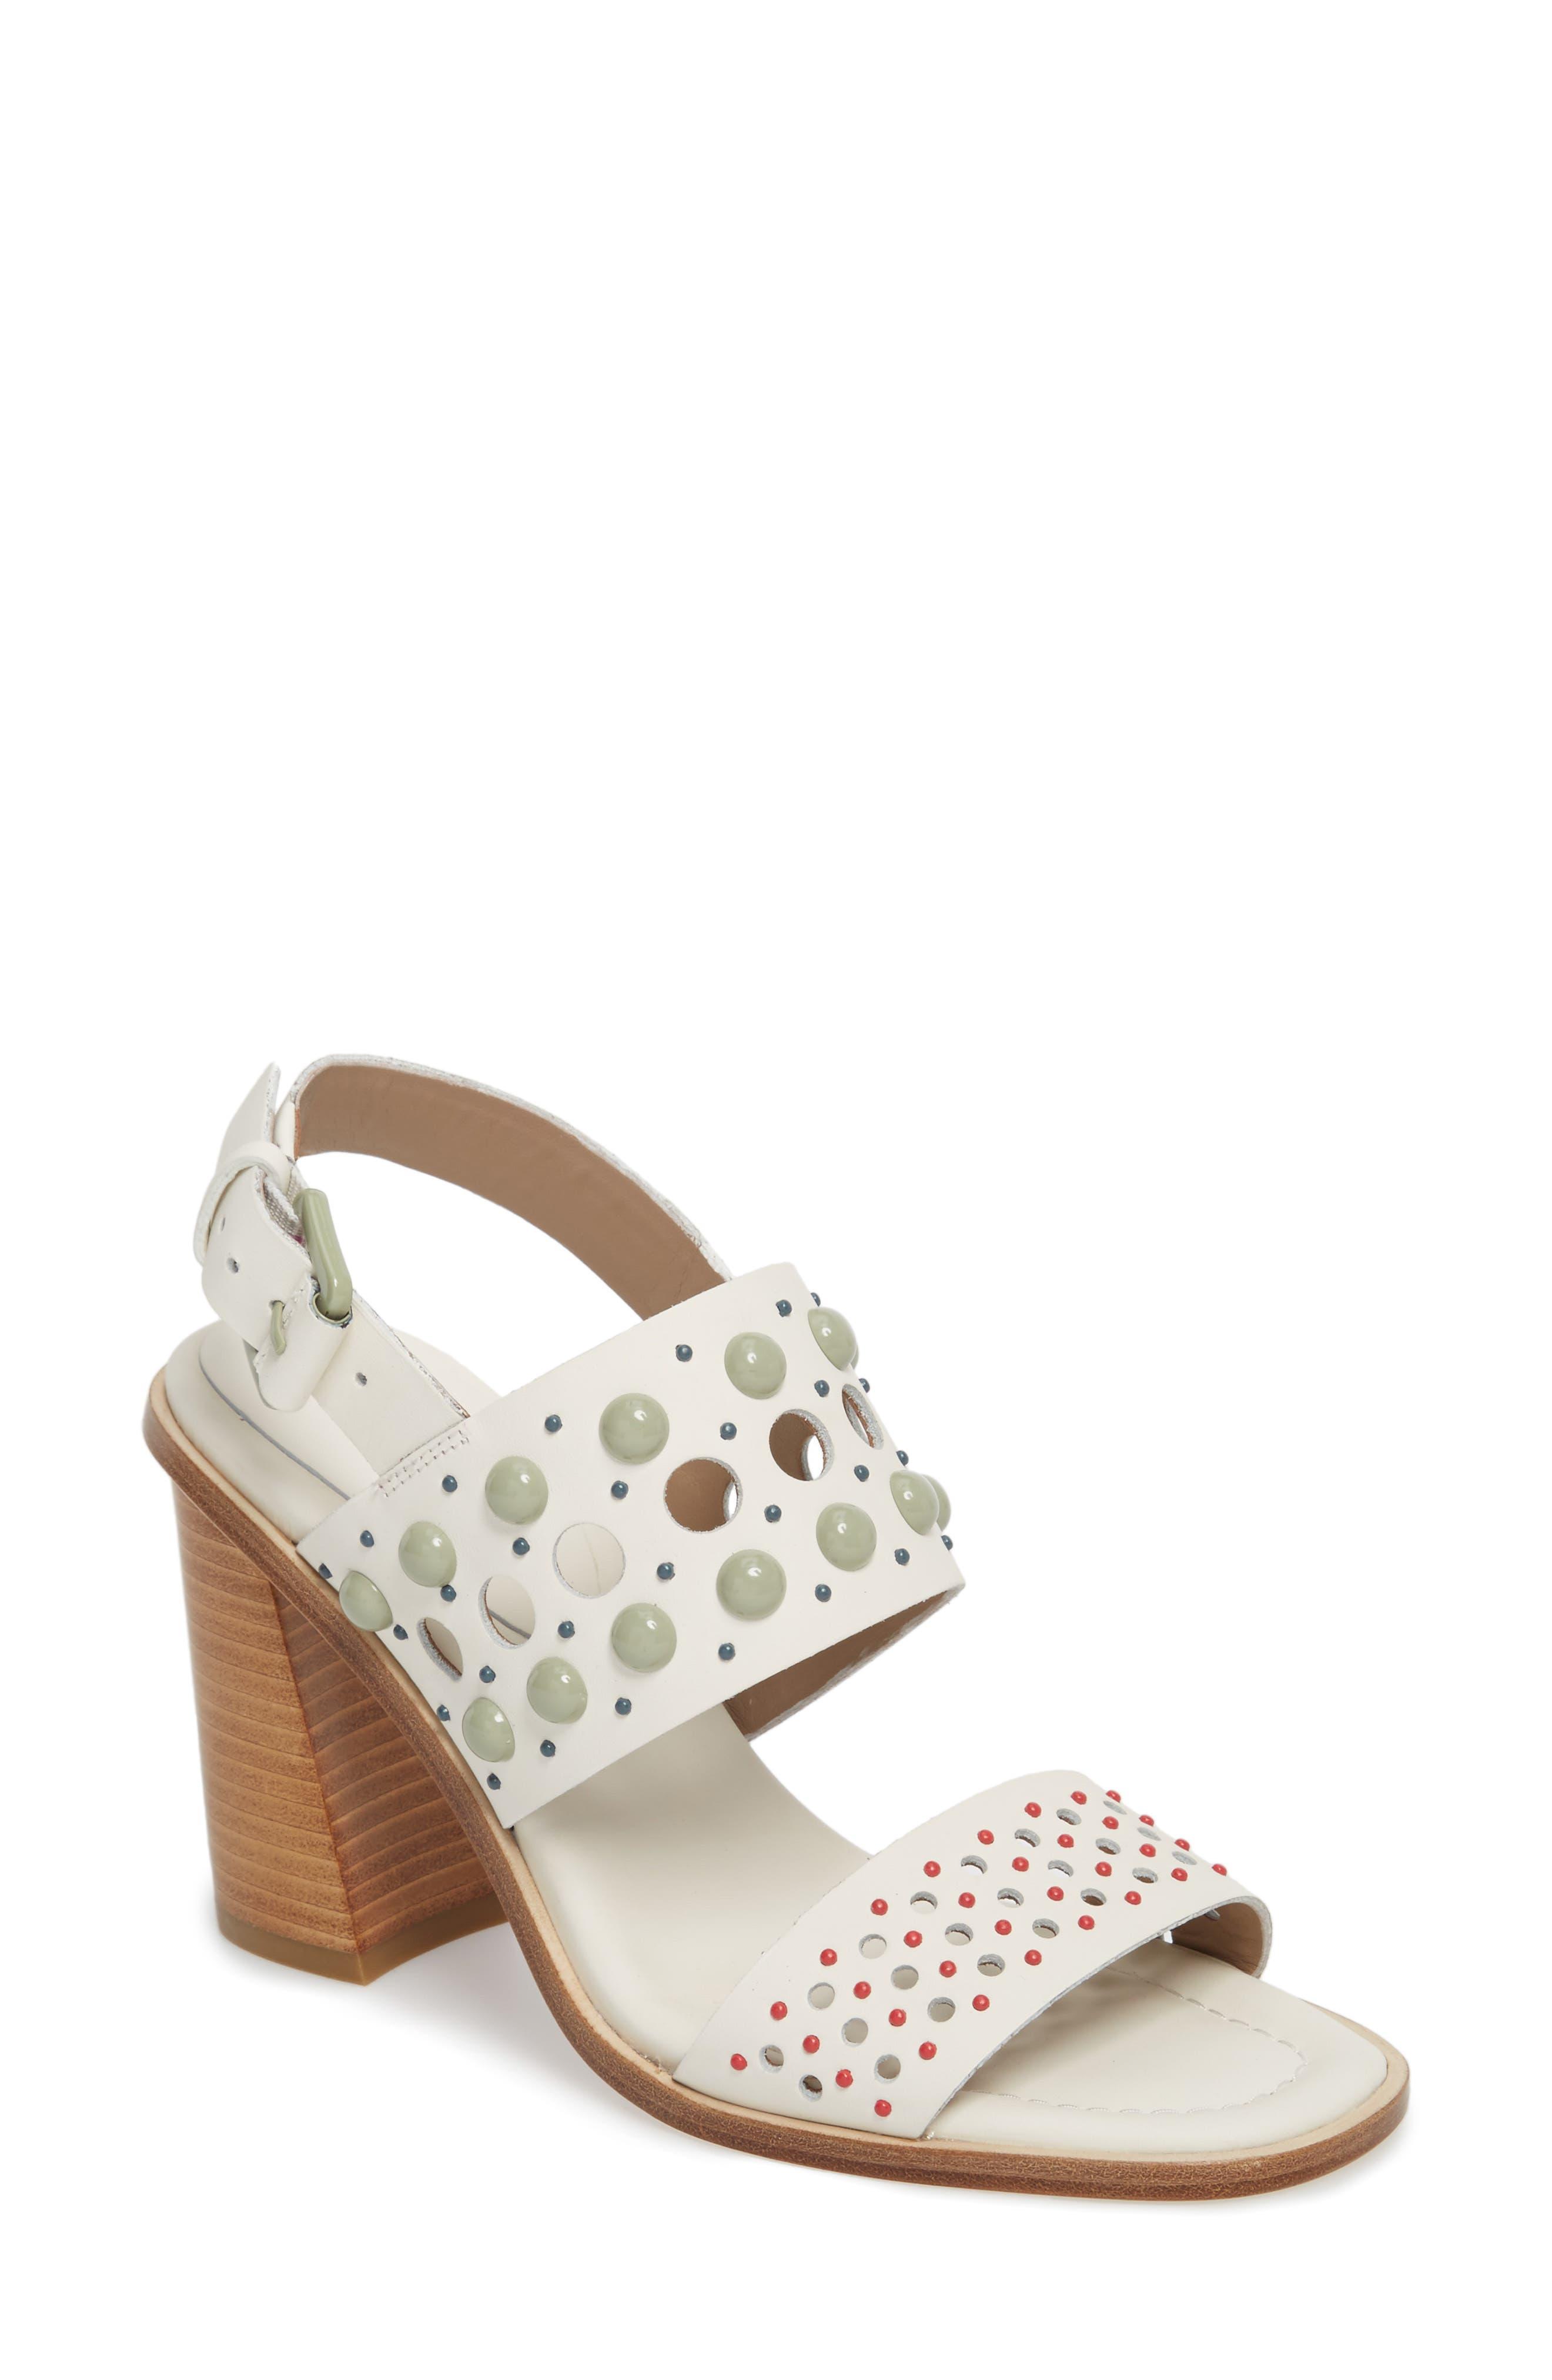 Estee Studded Sandal,                         Main,                         color, Bone Leather